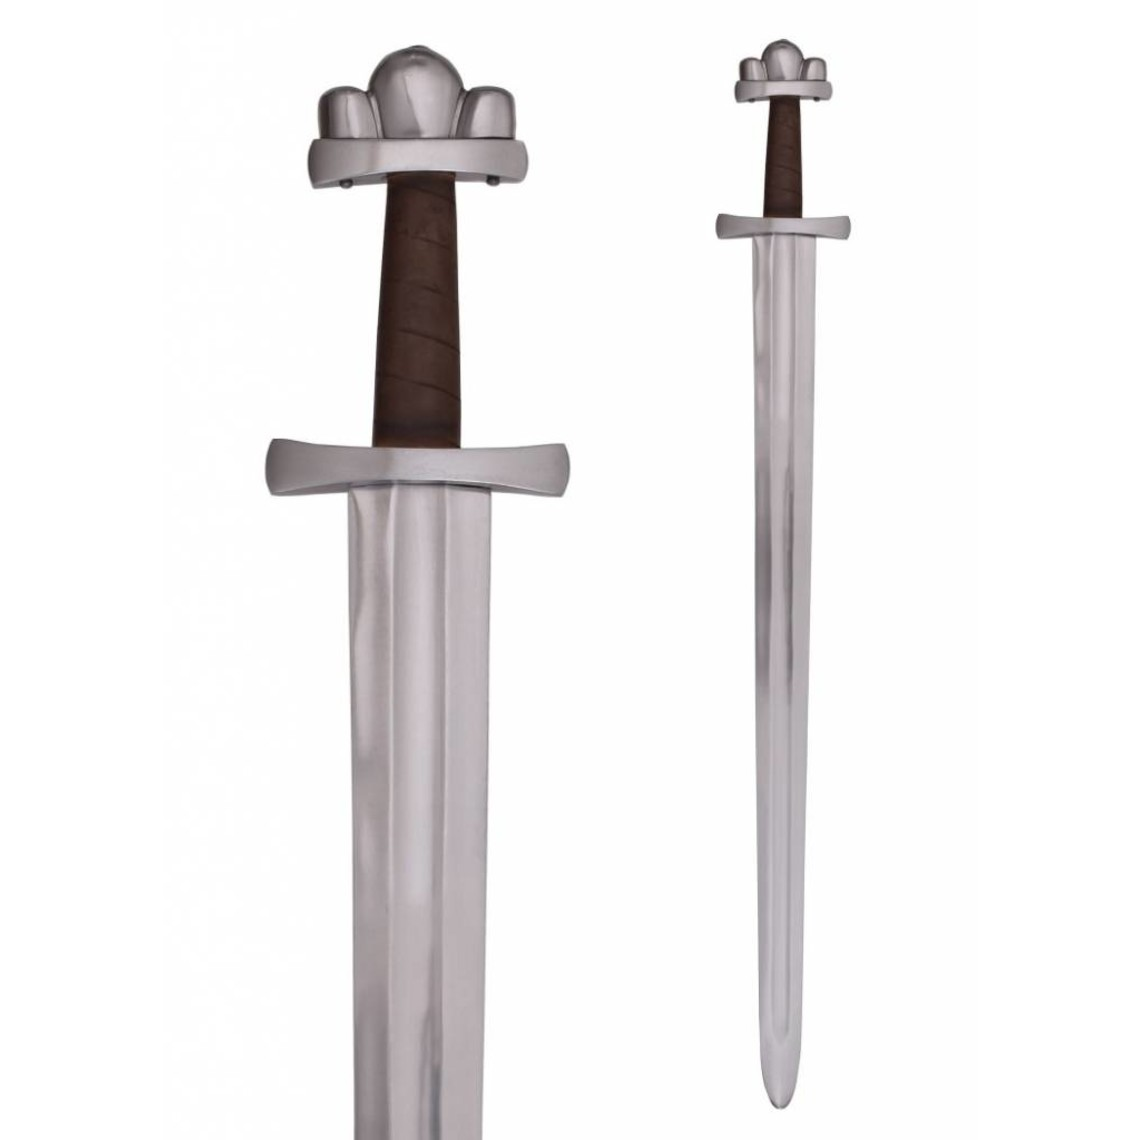 Deepeeka Espada vikinga de los noruegos del siglo X